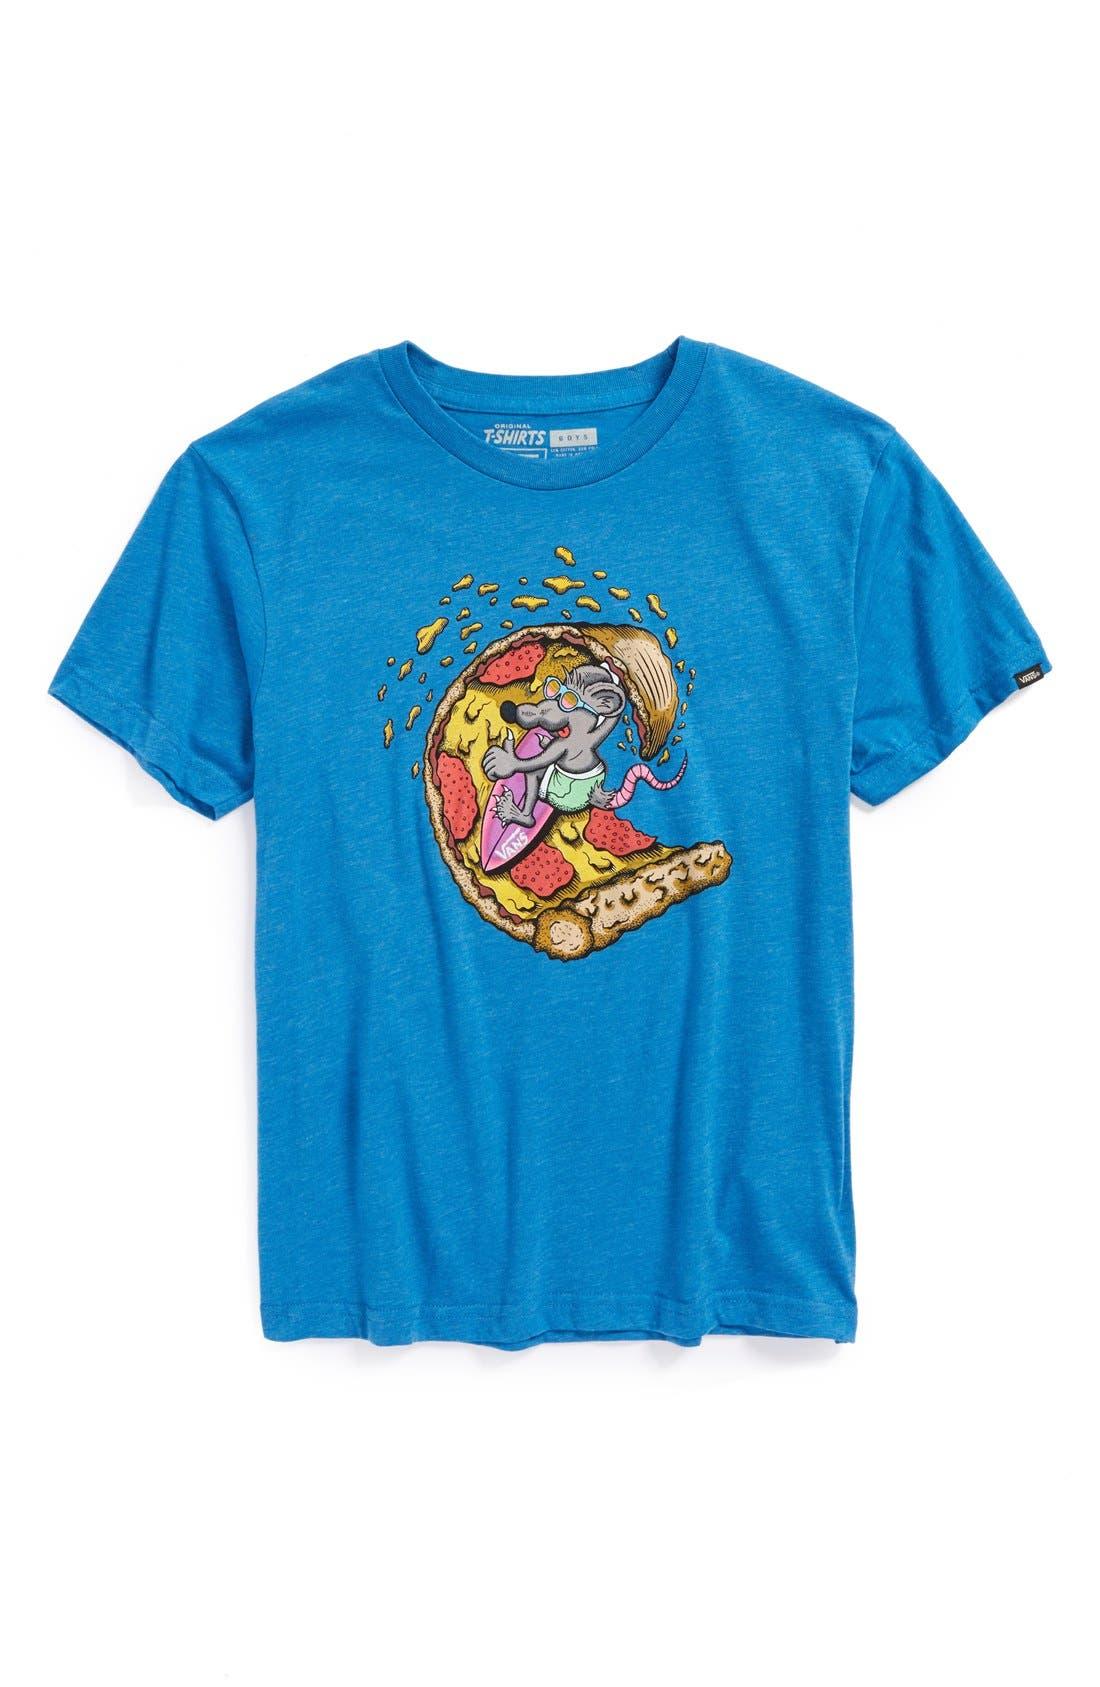 Alternate Image 1 Selected - Vans 'Pizza Rat' Short Sleeve T-Shirt (Big Boys)